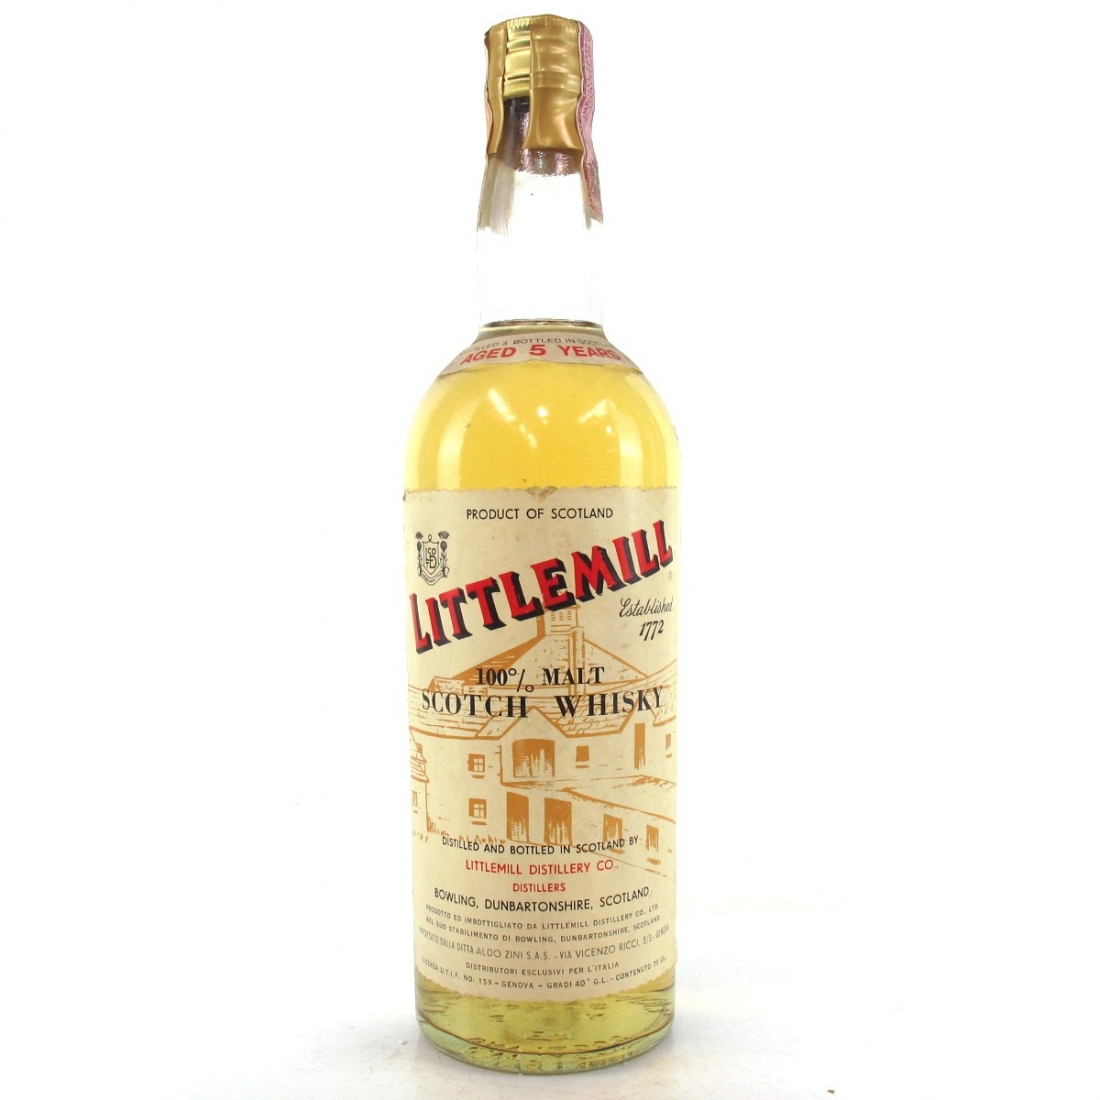 Littlemill 5 Year Old 1960/70s